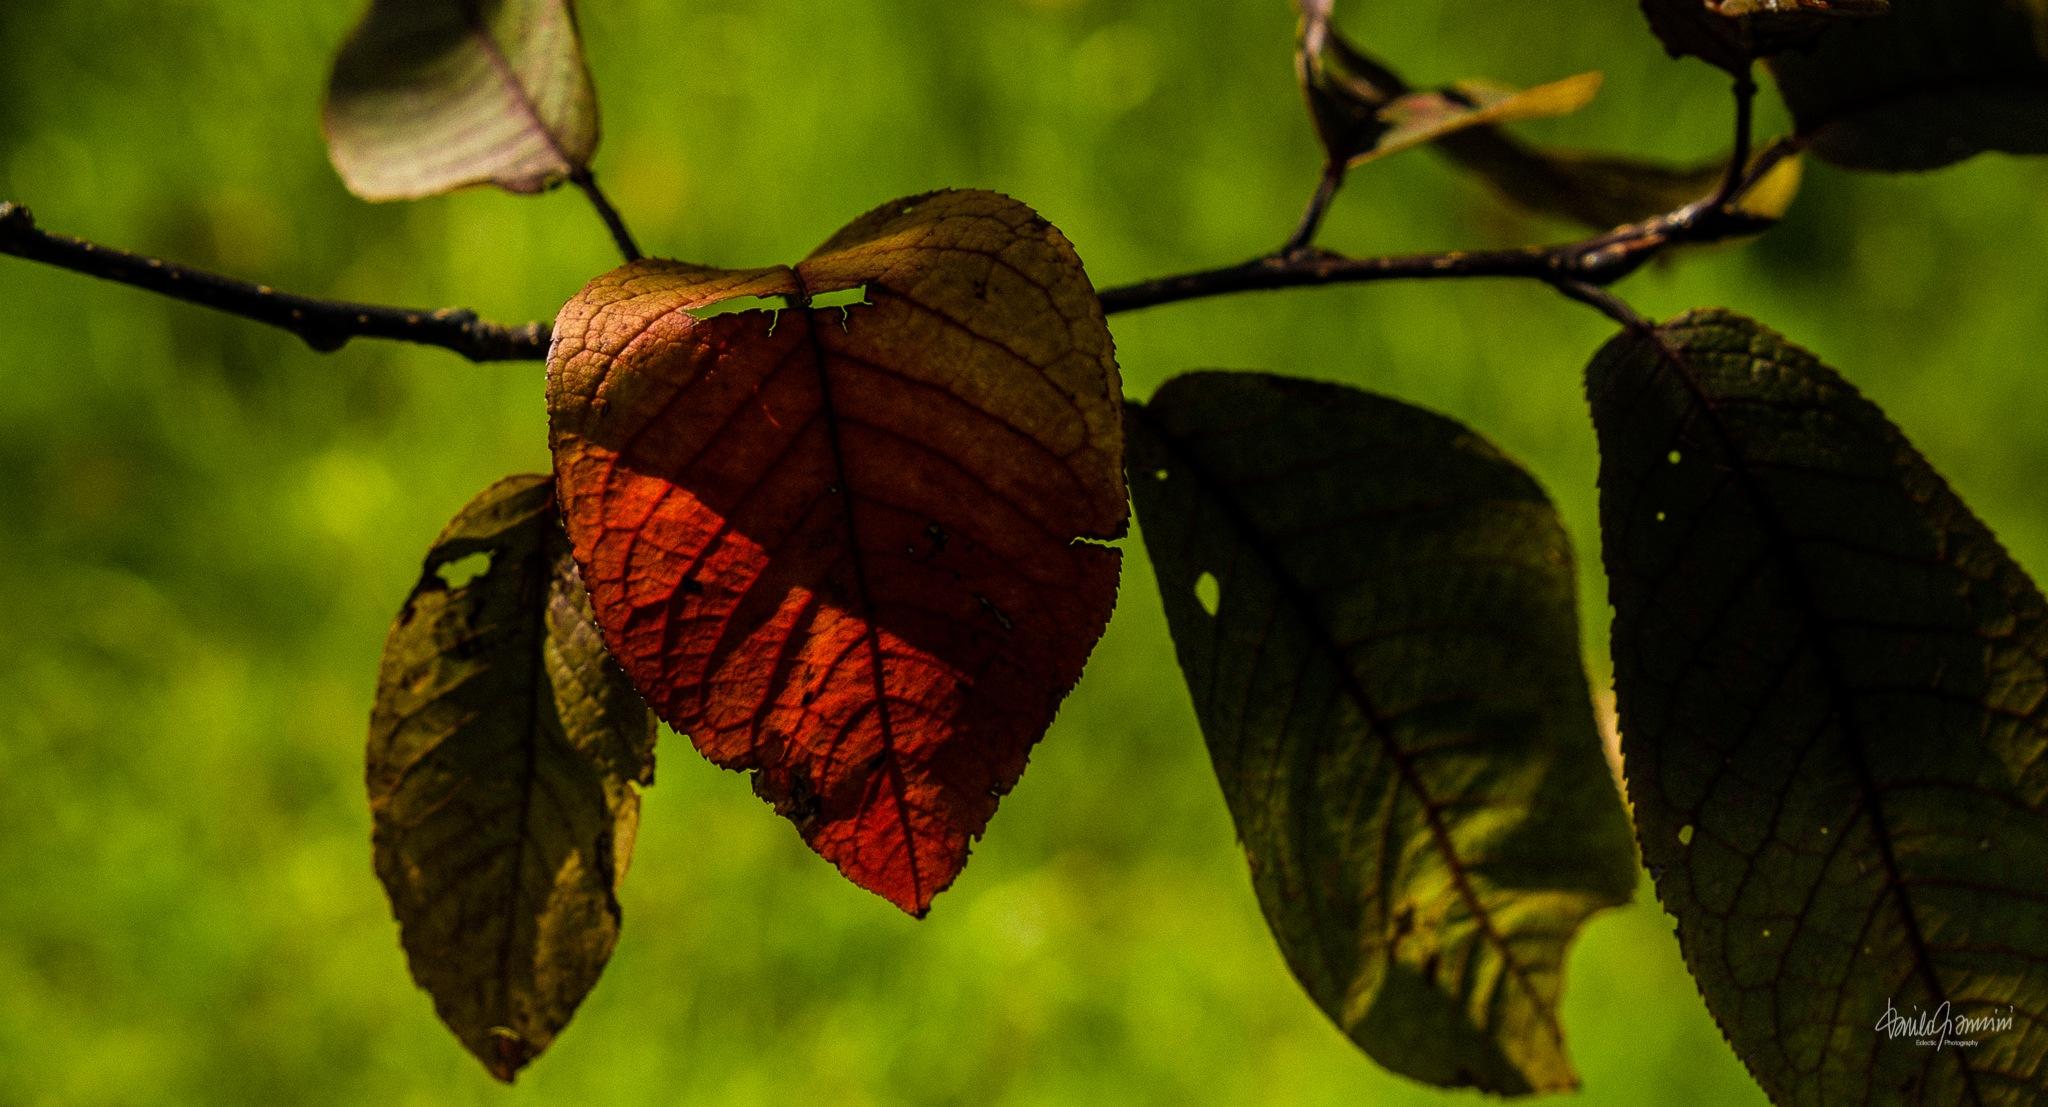 Leaves by Danilo Giannini